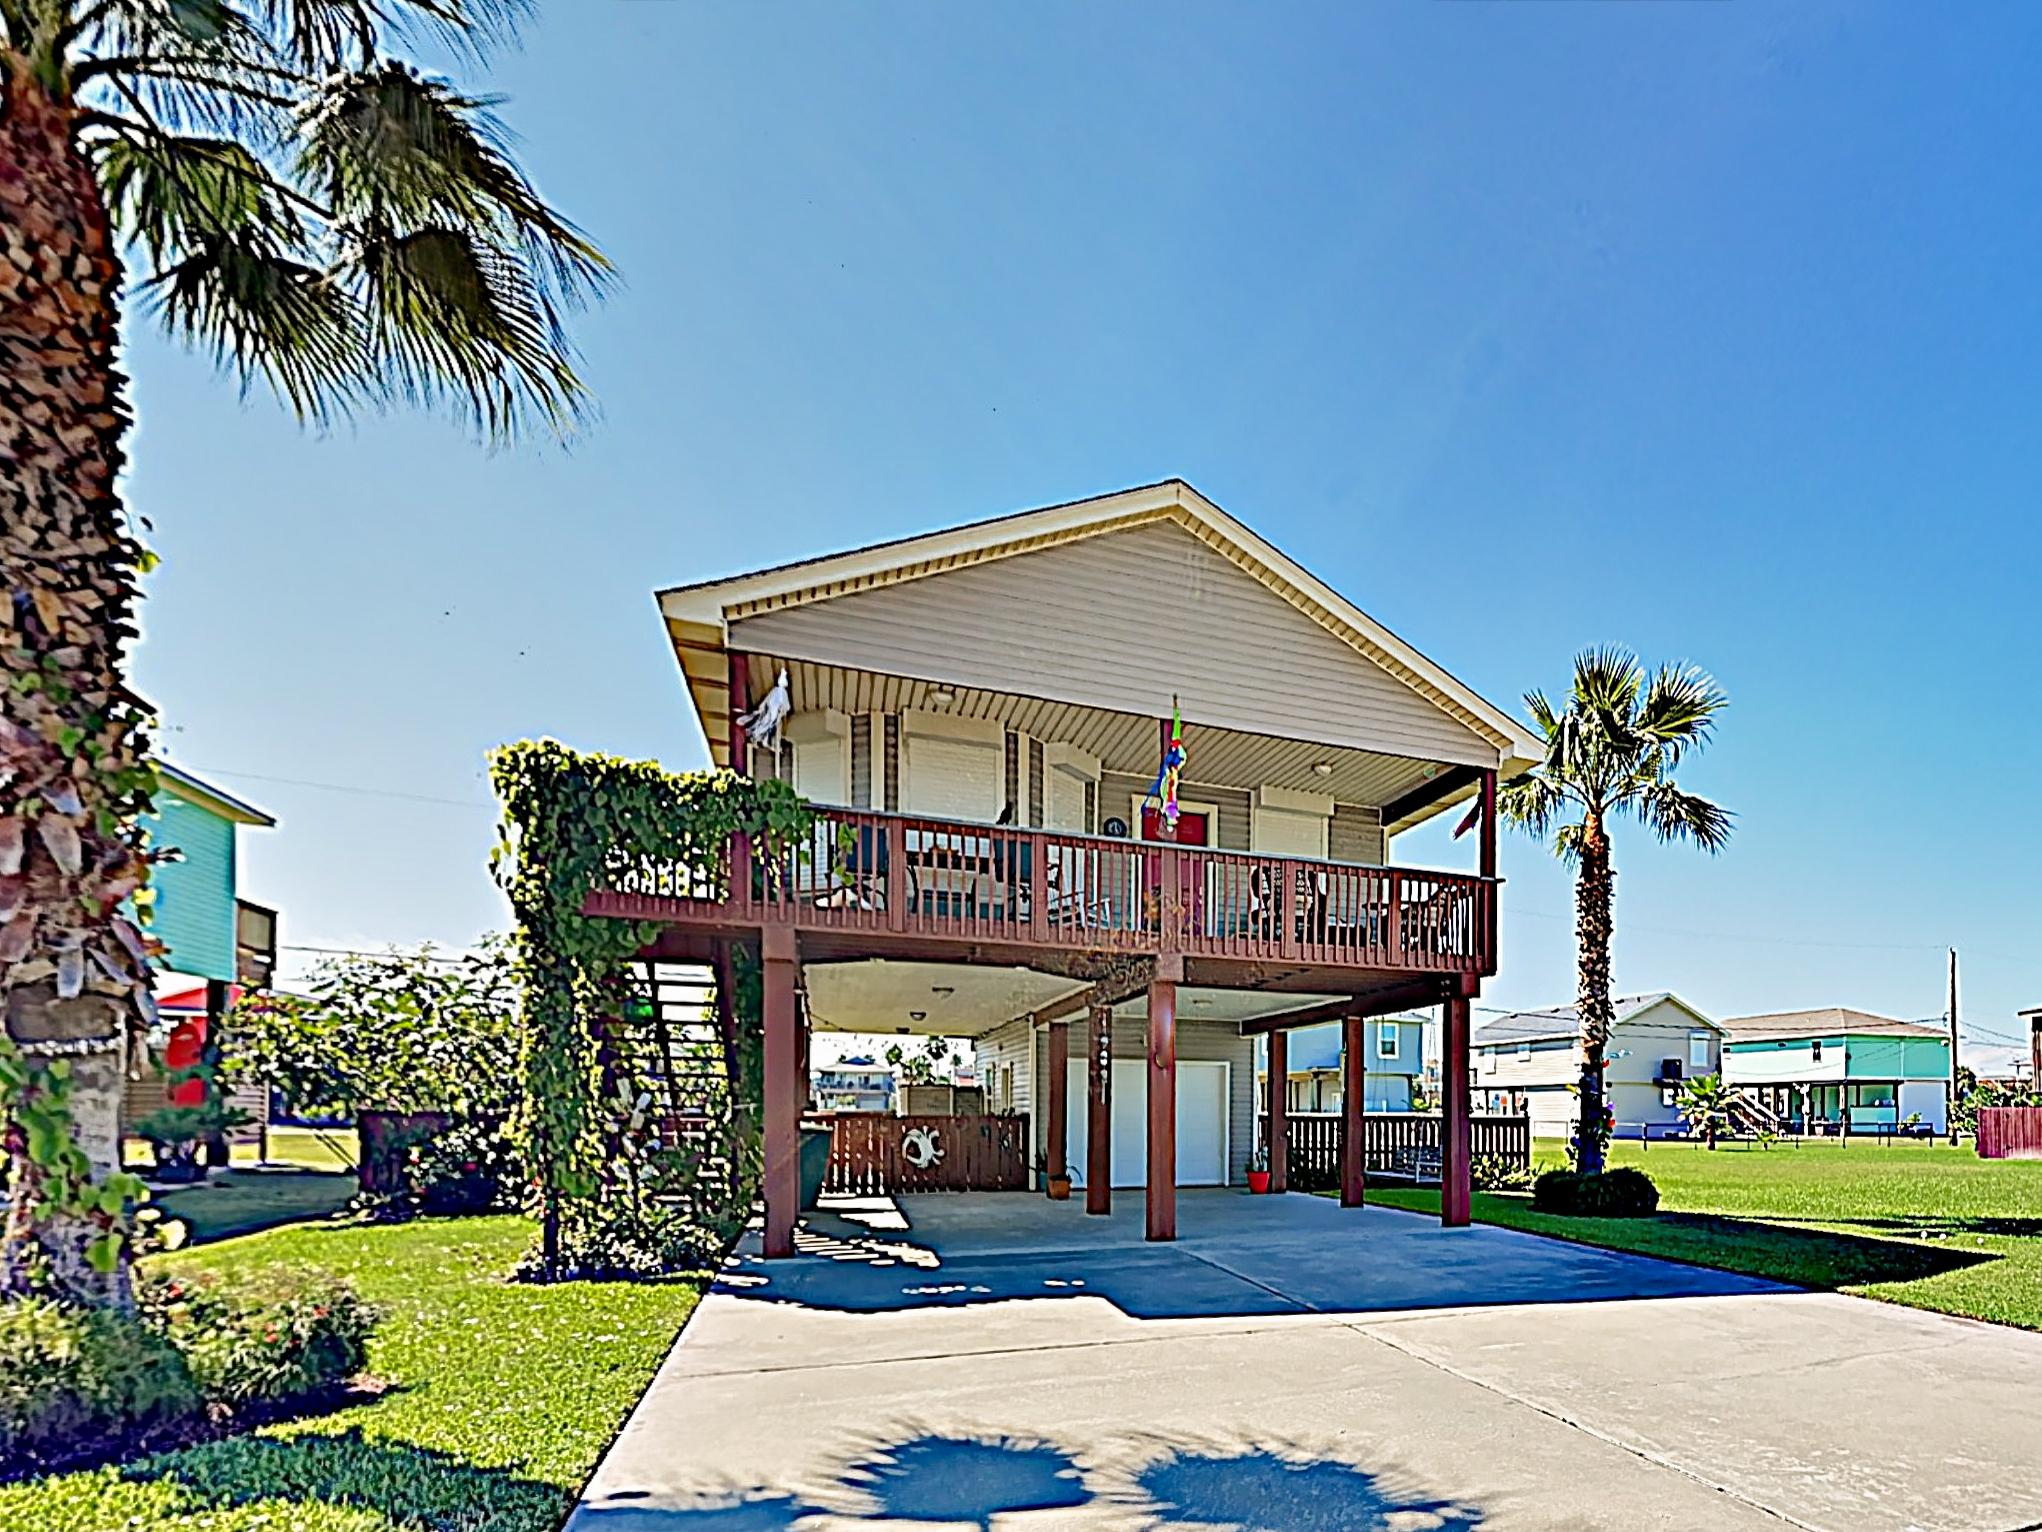 Galveston TX Vacation Rental Welcome to Galveston!